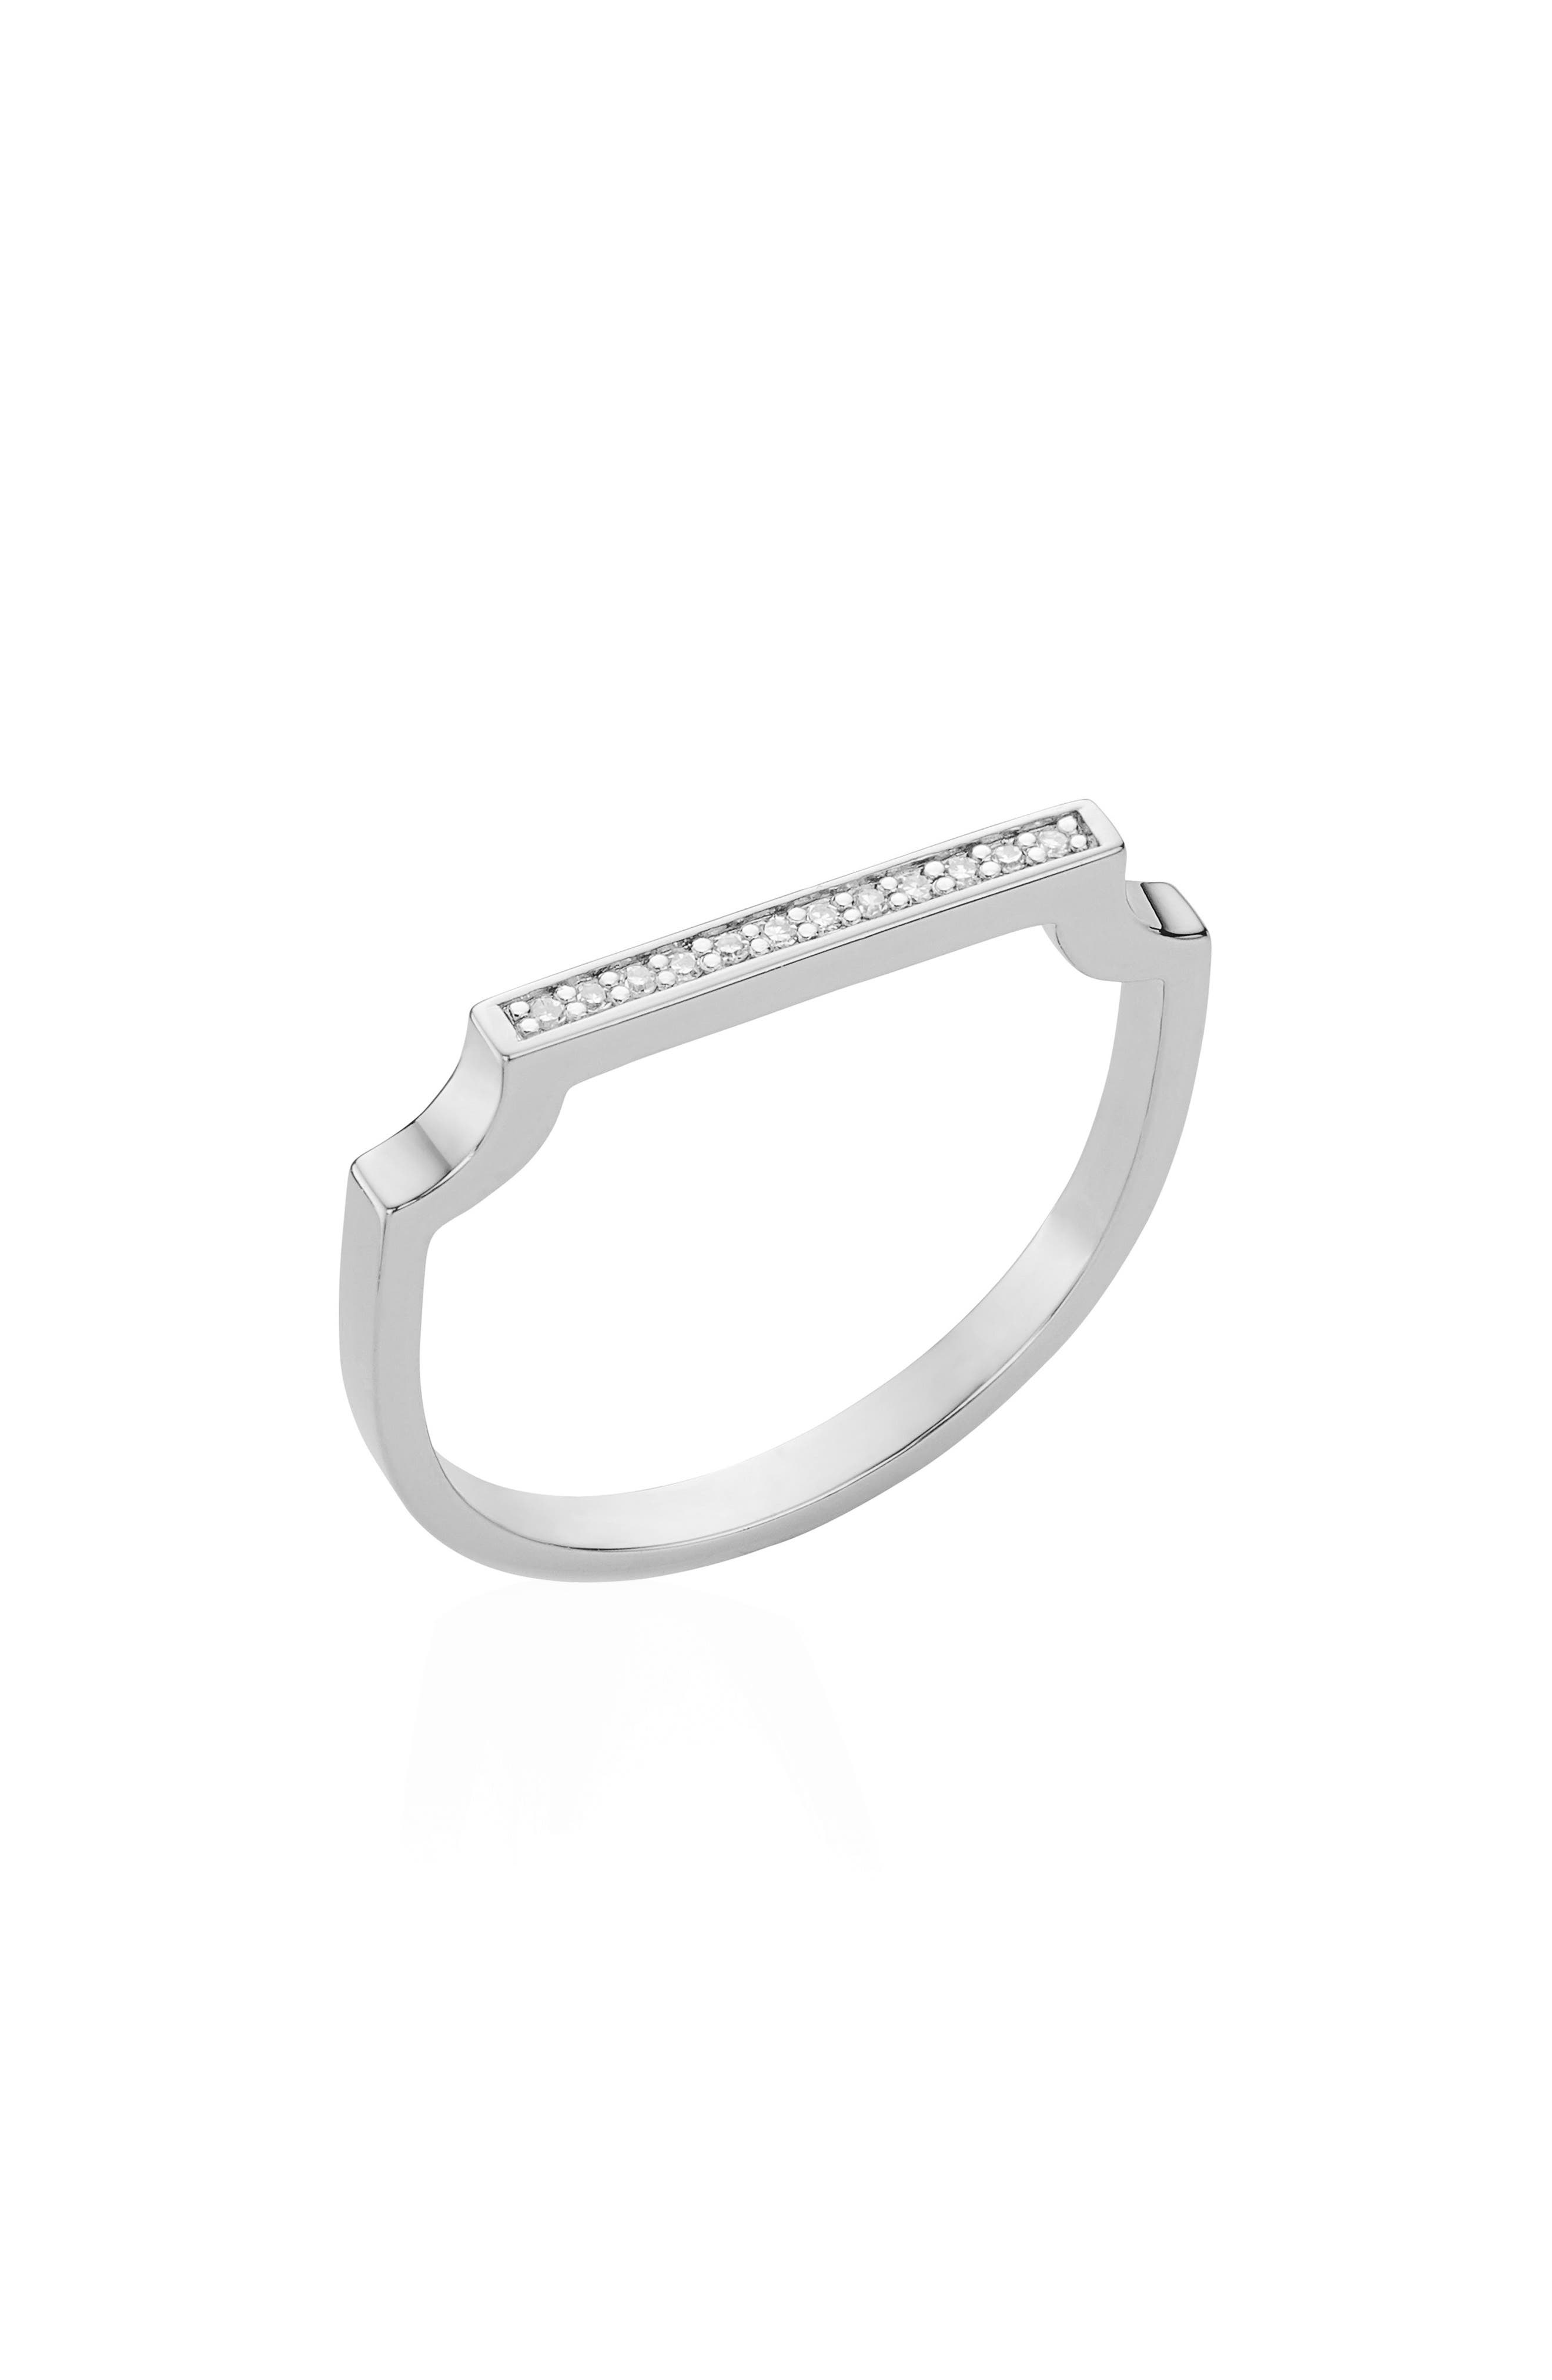 Signature Thin Diamond Ring,                         Main,                         color, SILVER/ DIAMOND